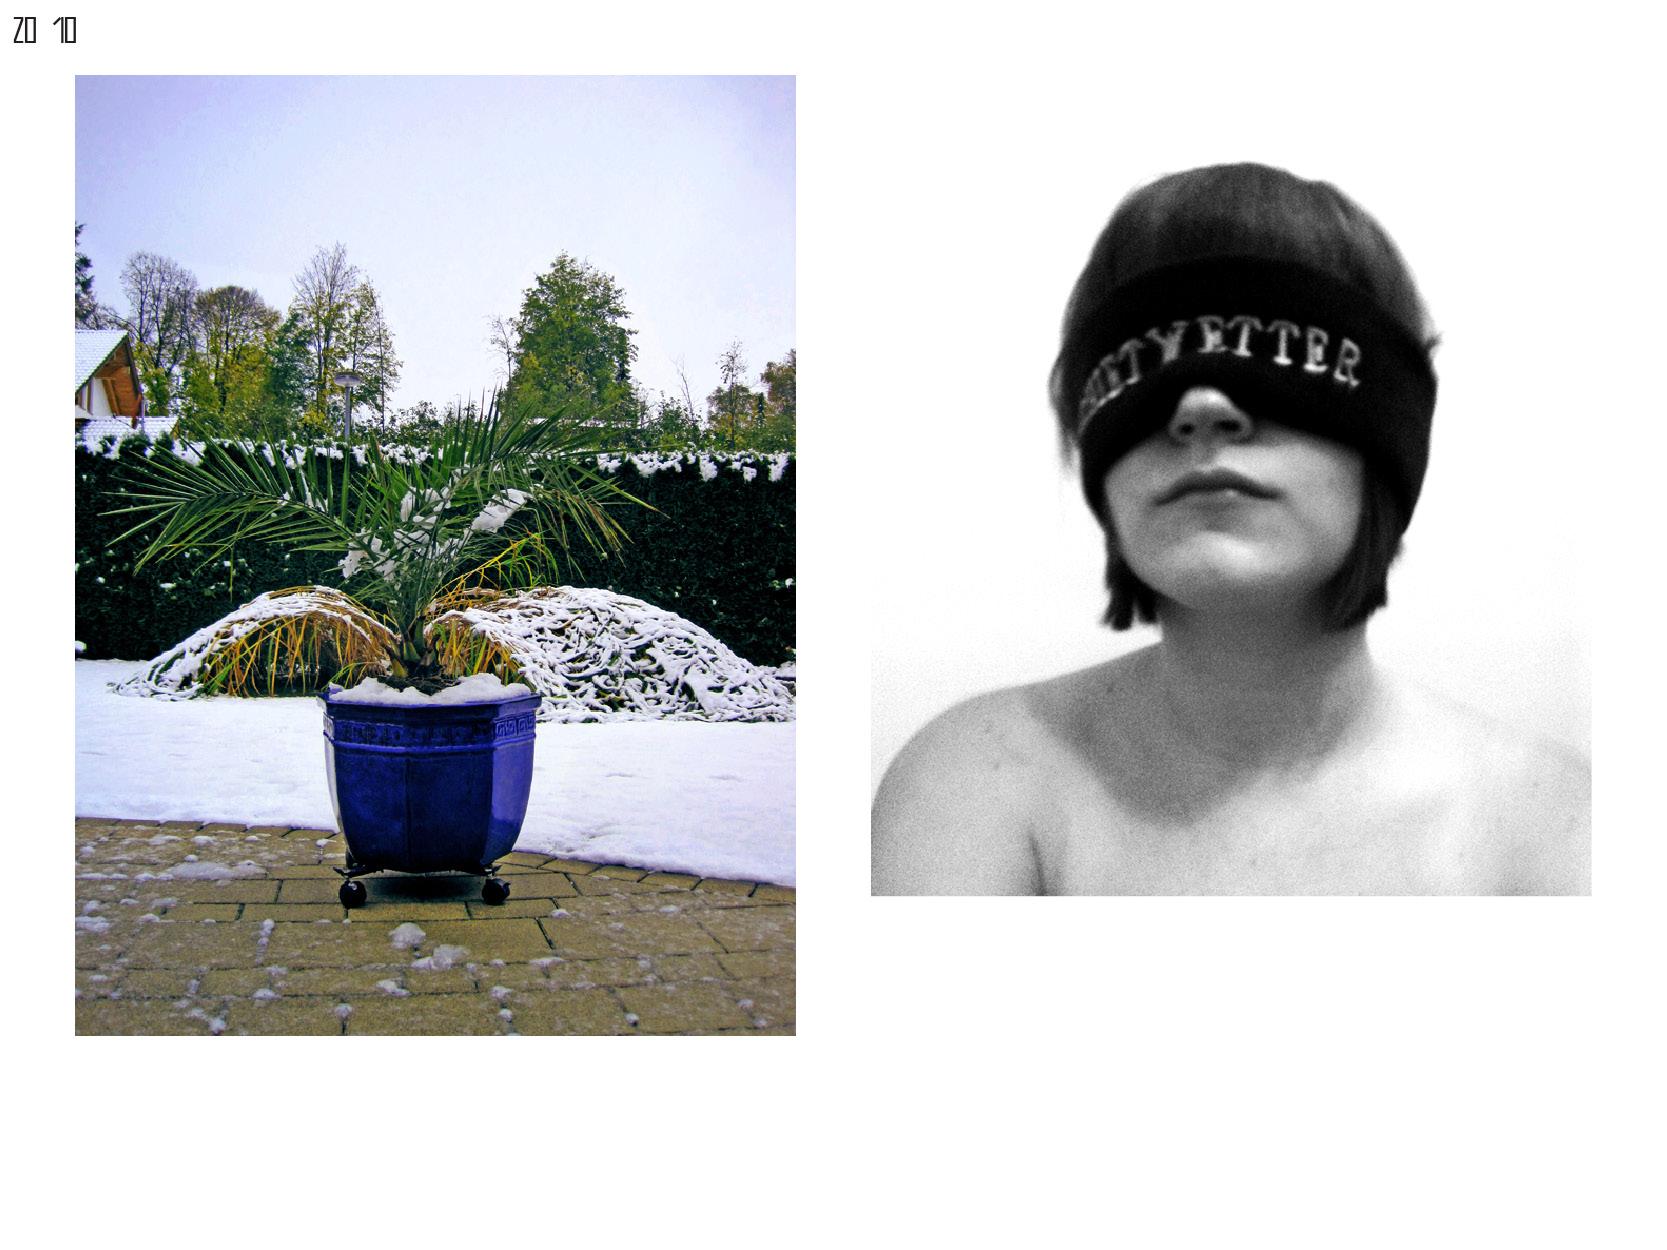 Gerrit-Schweiger-Dialog-Städte-Paris-Berlin-Jessica-Blank-Experiment-Fotoserie-Tagebuch-visuelle-Kommunikation-5